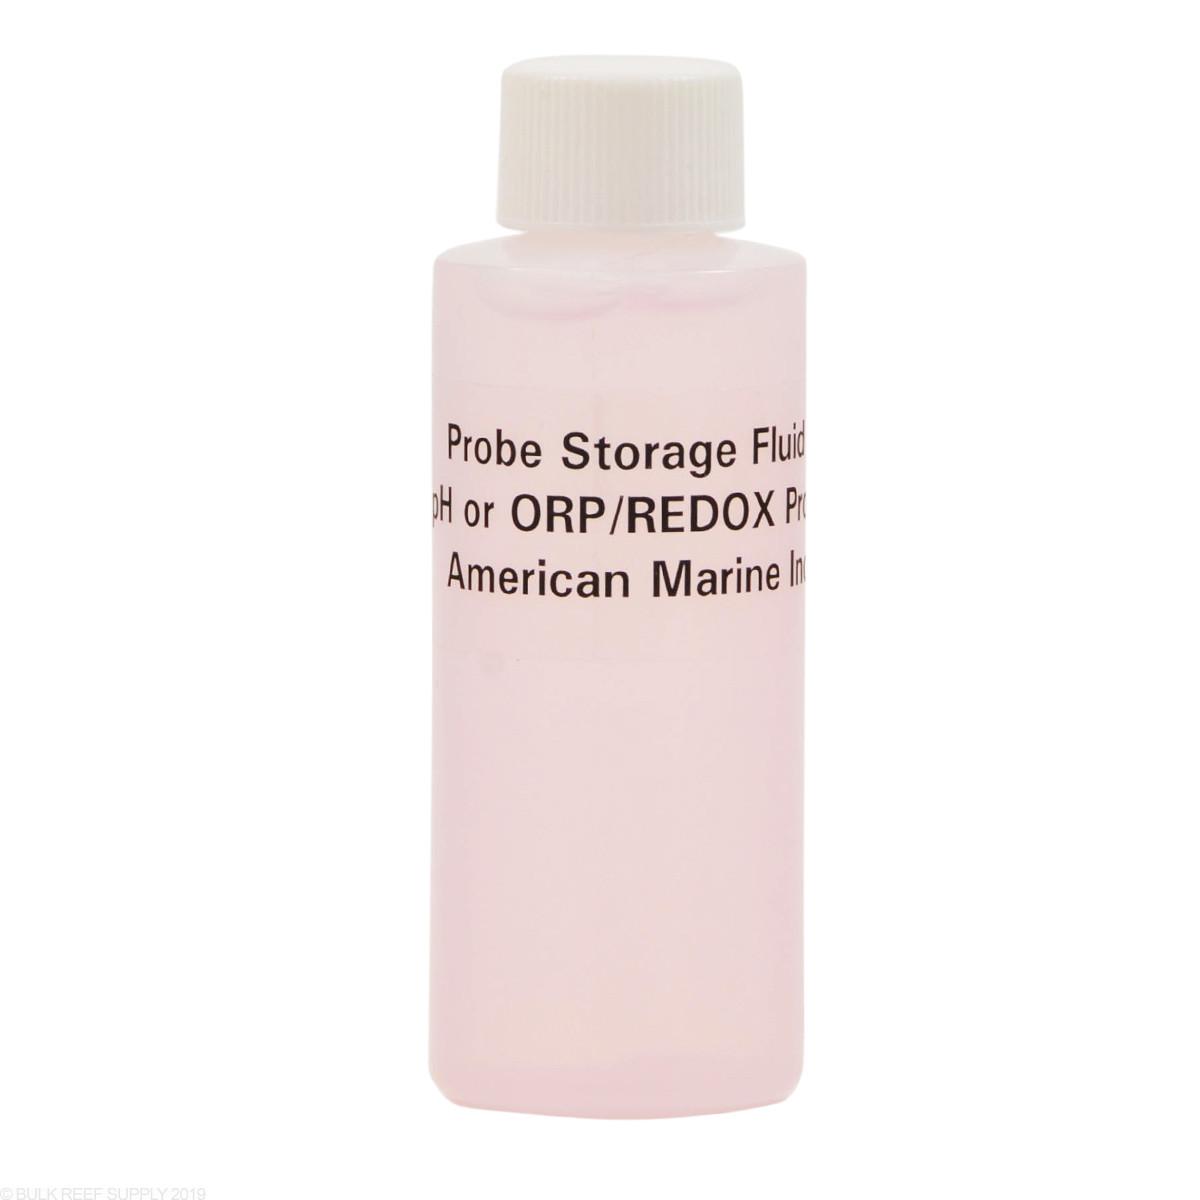 Probe Storage Fluid